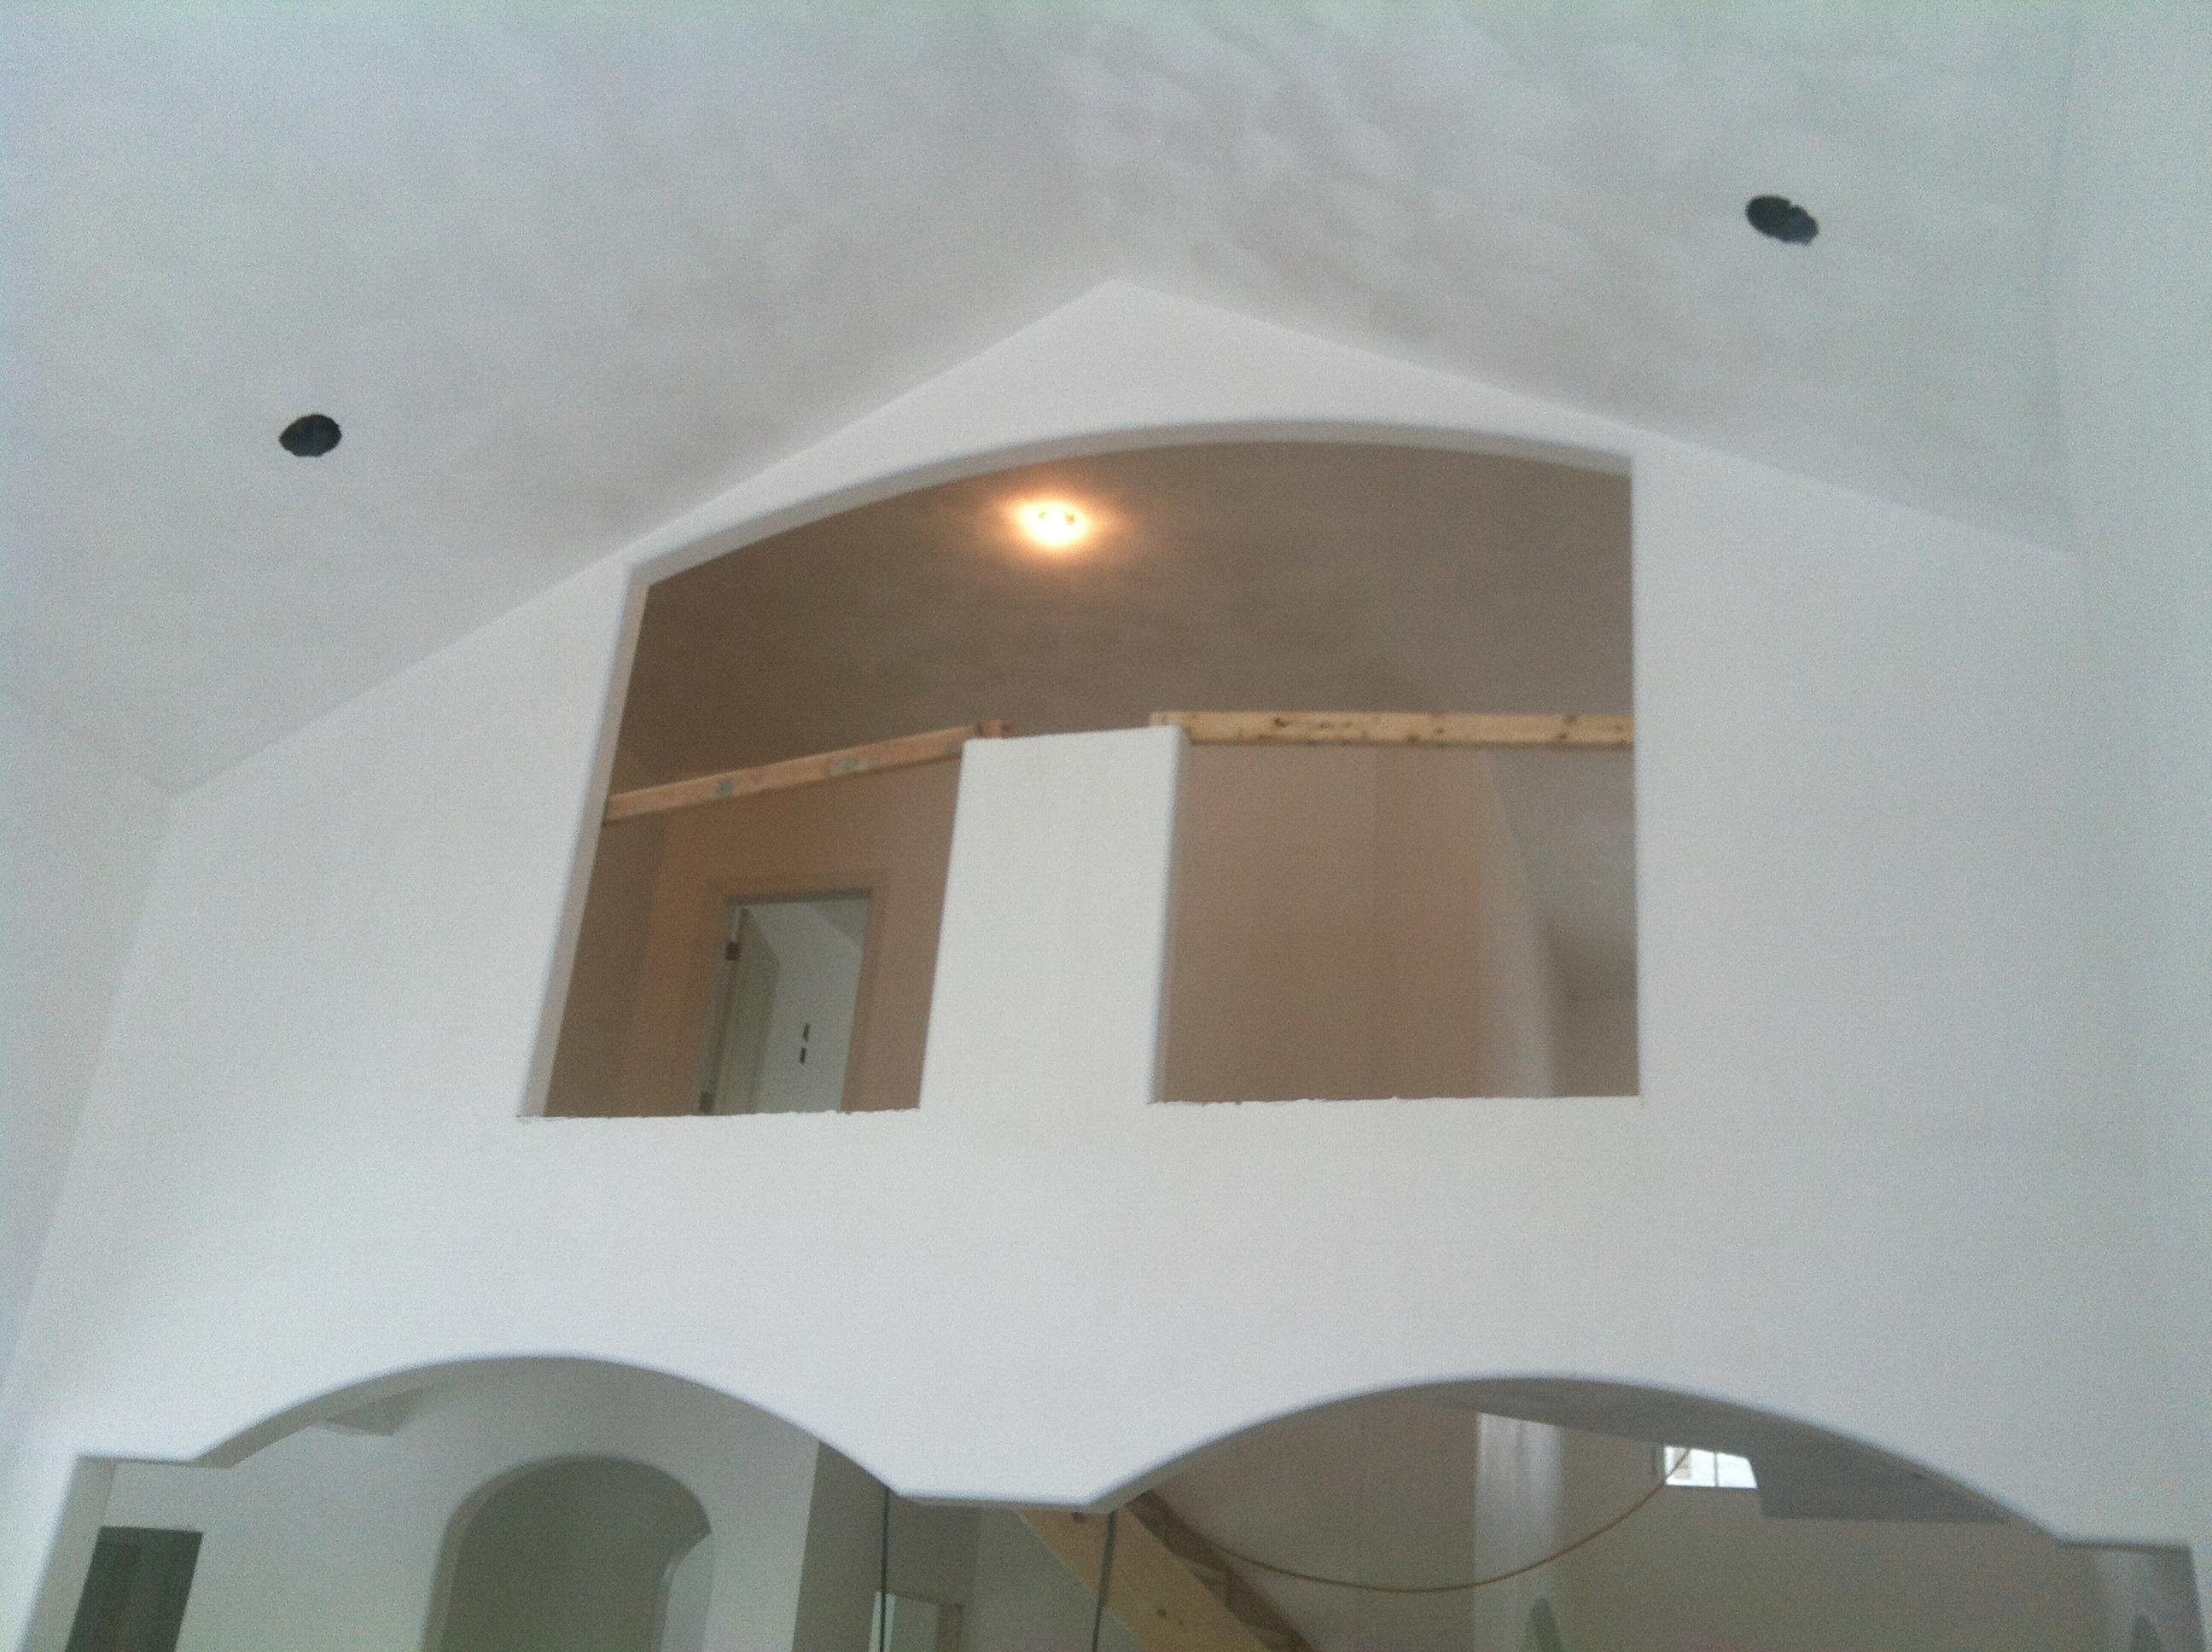 Renfro Plastering Contracting image 4